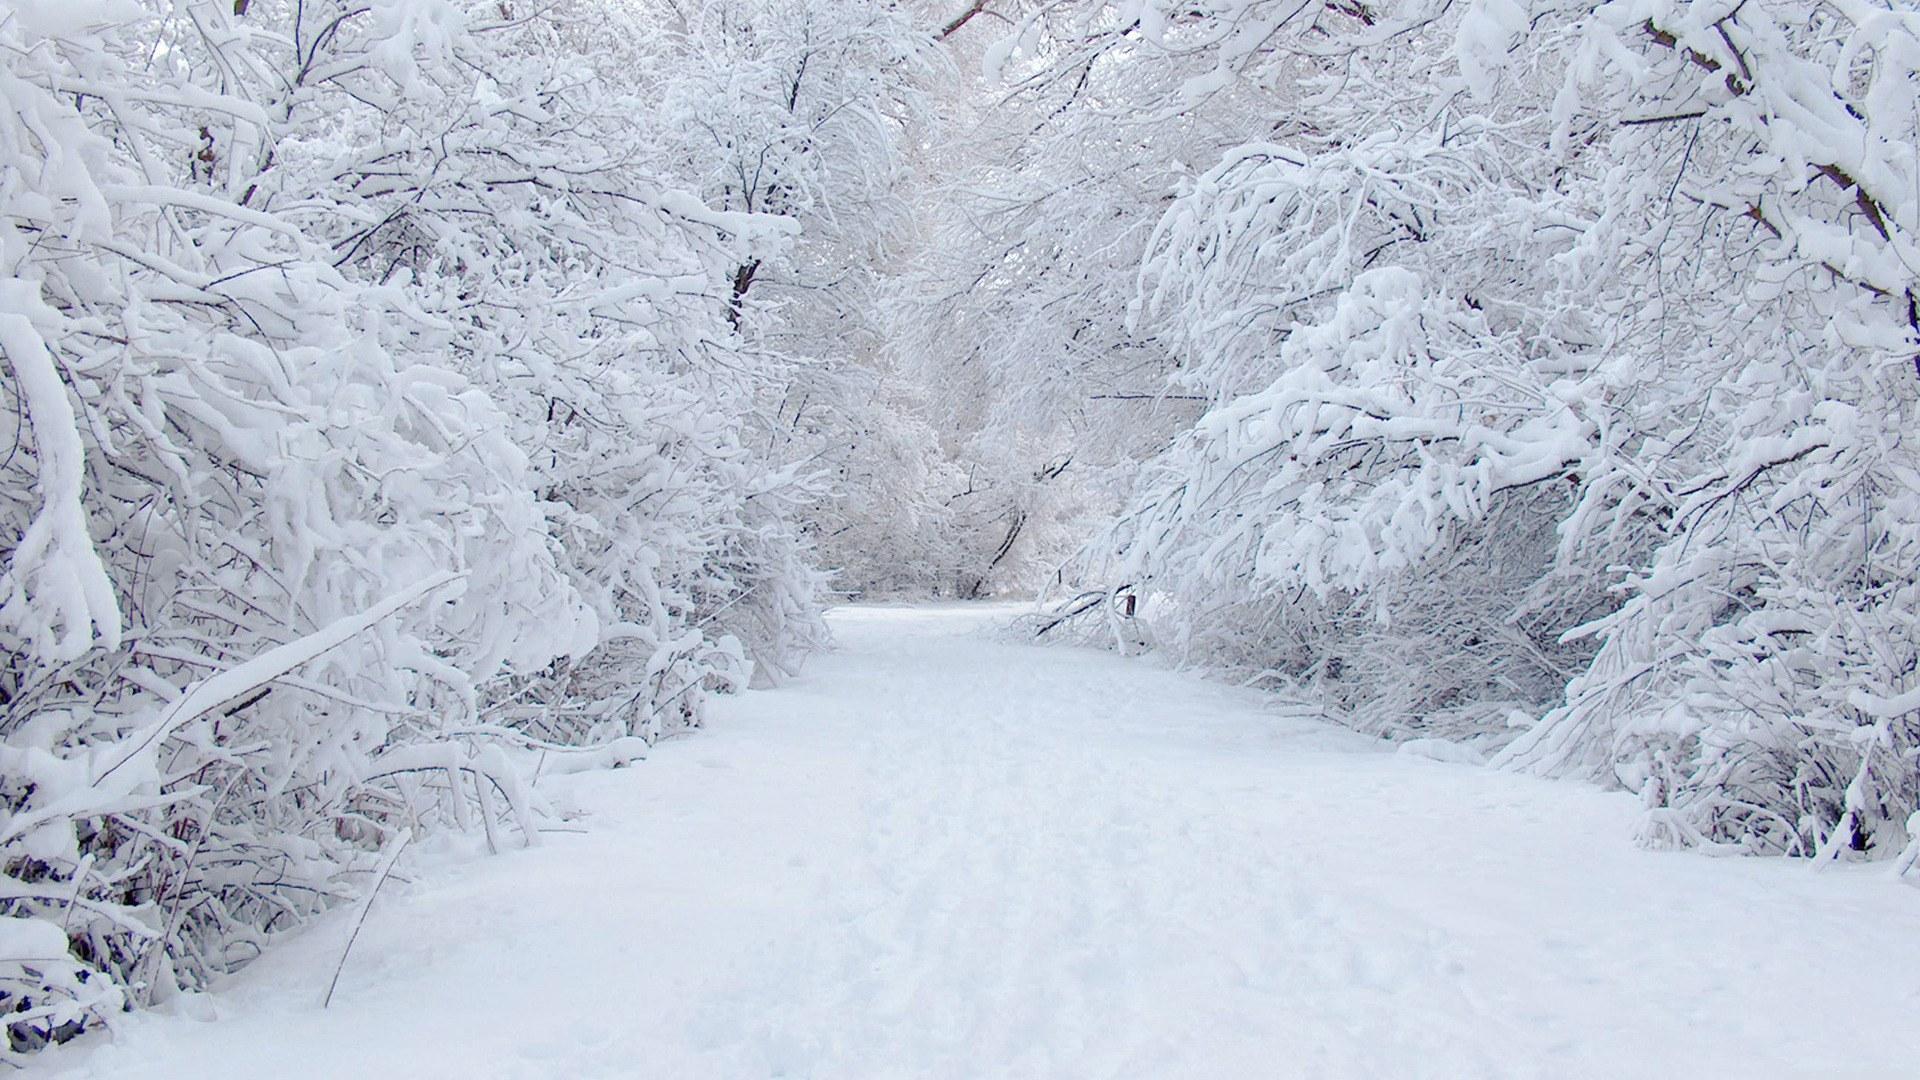 Wallpaper ไหนว่าปีนี้จะหนาวสุดในรอบ 30 ปี 50 Pic 229036-Sepik